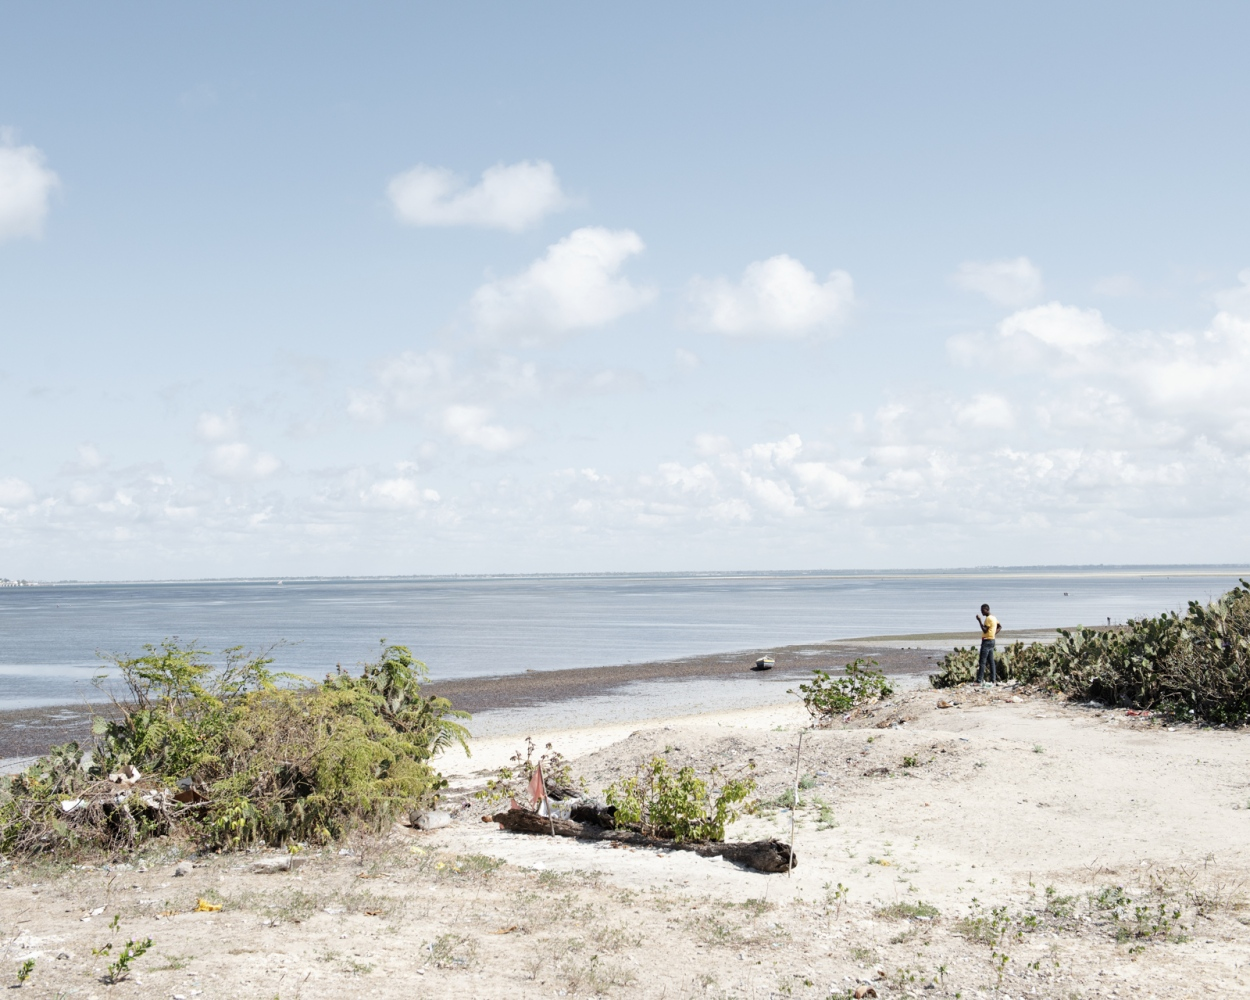 A view of the coast near Ilha de Mozambique.